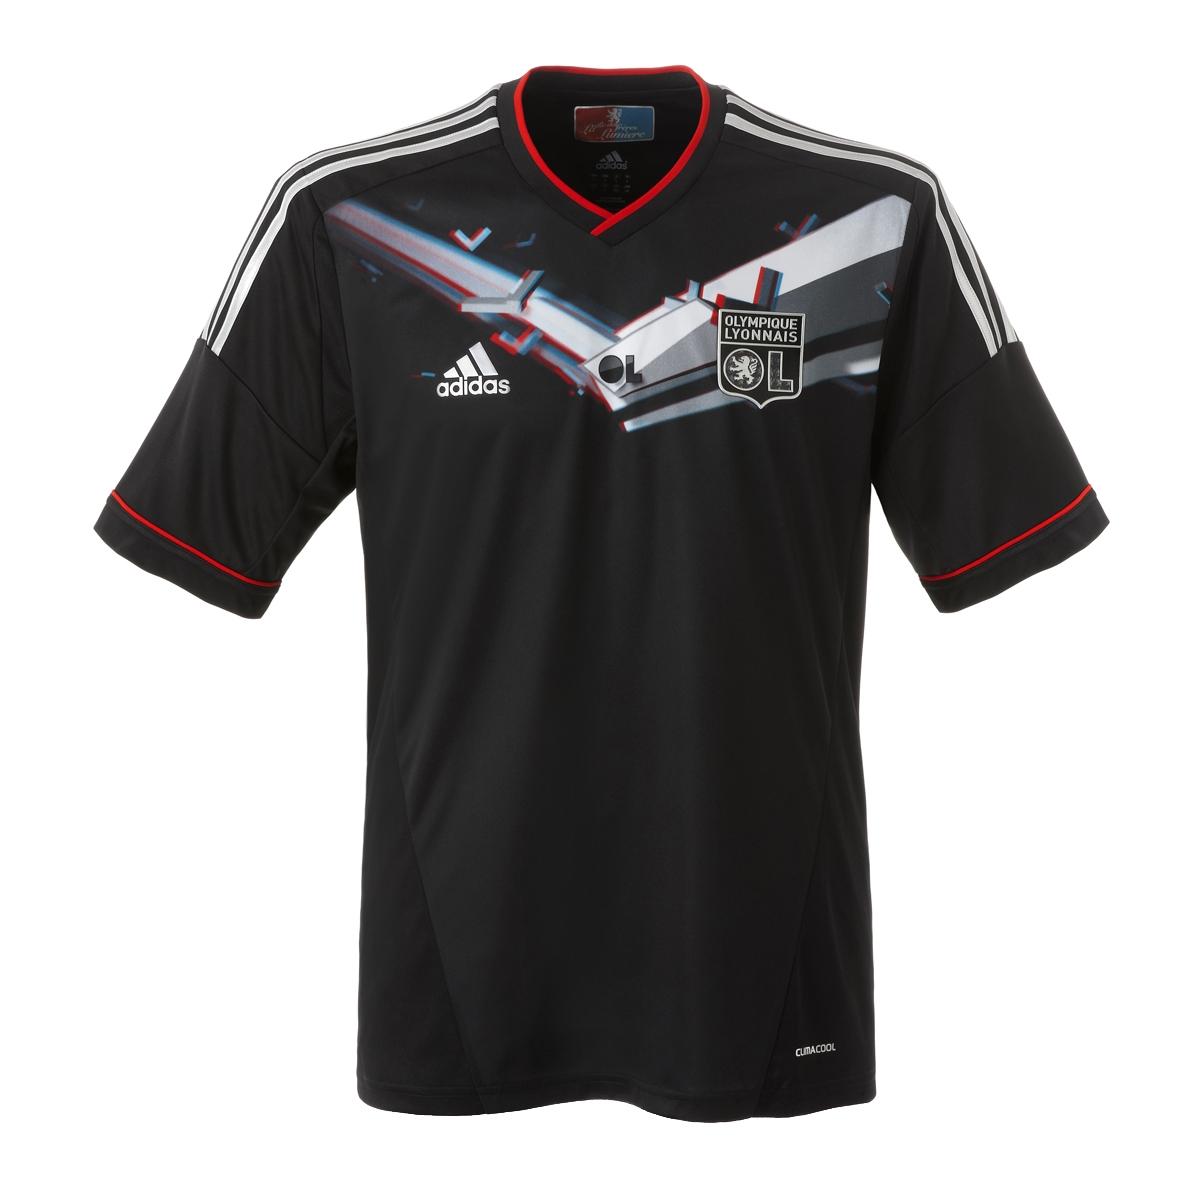 ... imágenes del Maillot 3D officiel Adidas Olympique Lyonnais 2012/2013